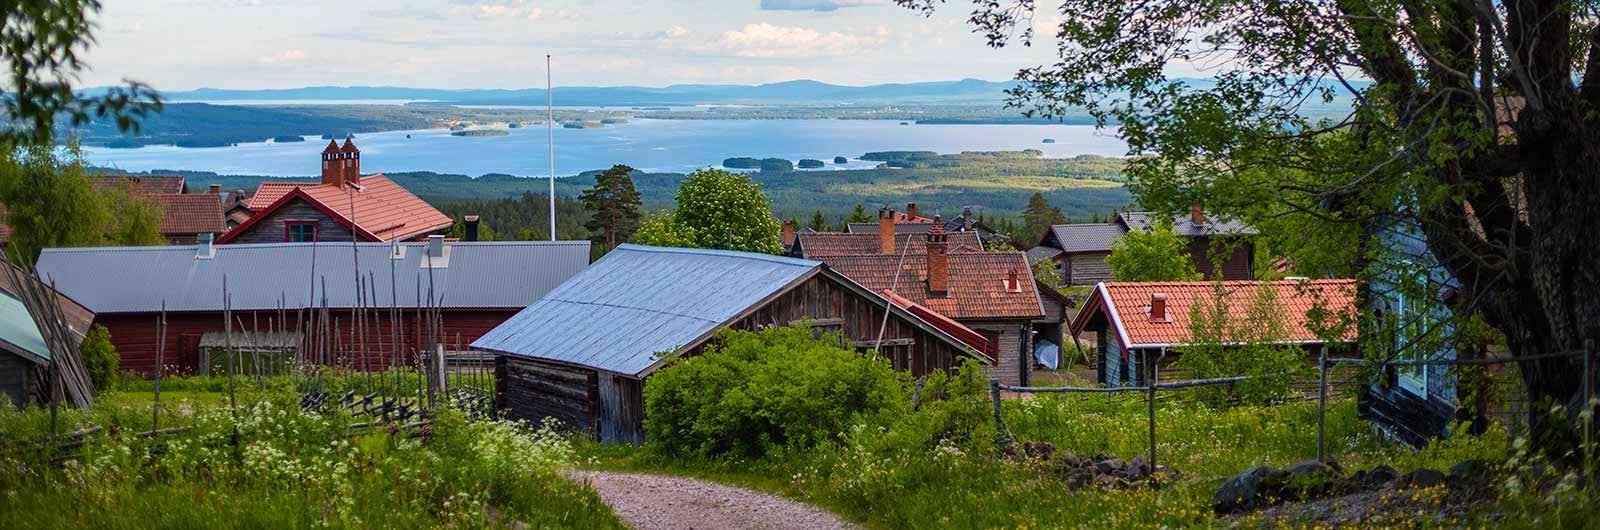 Wooden houses along Siljan Signature Trail